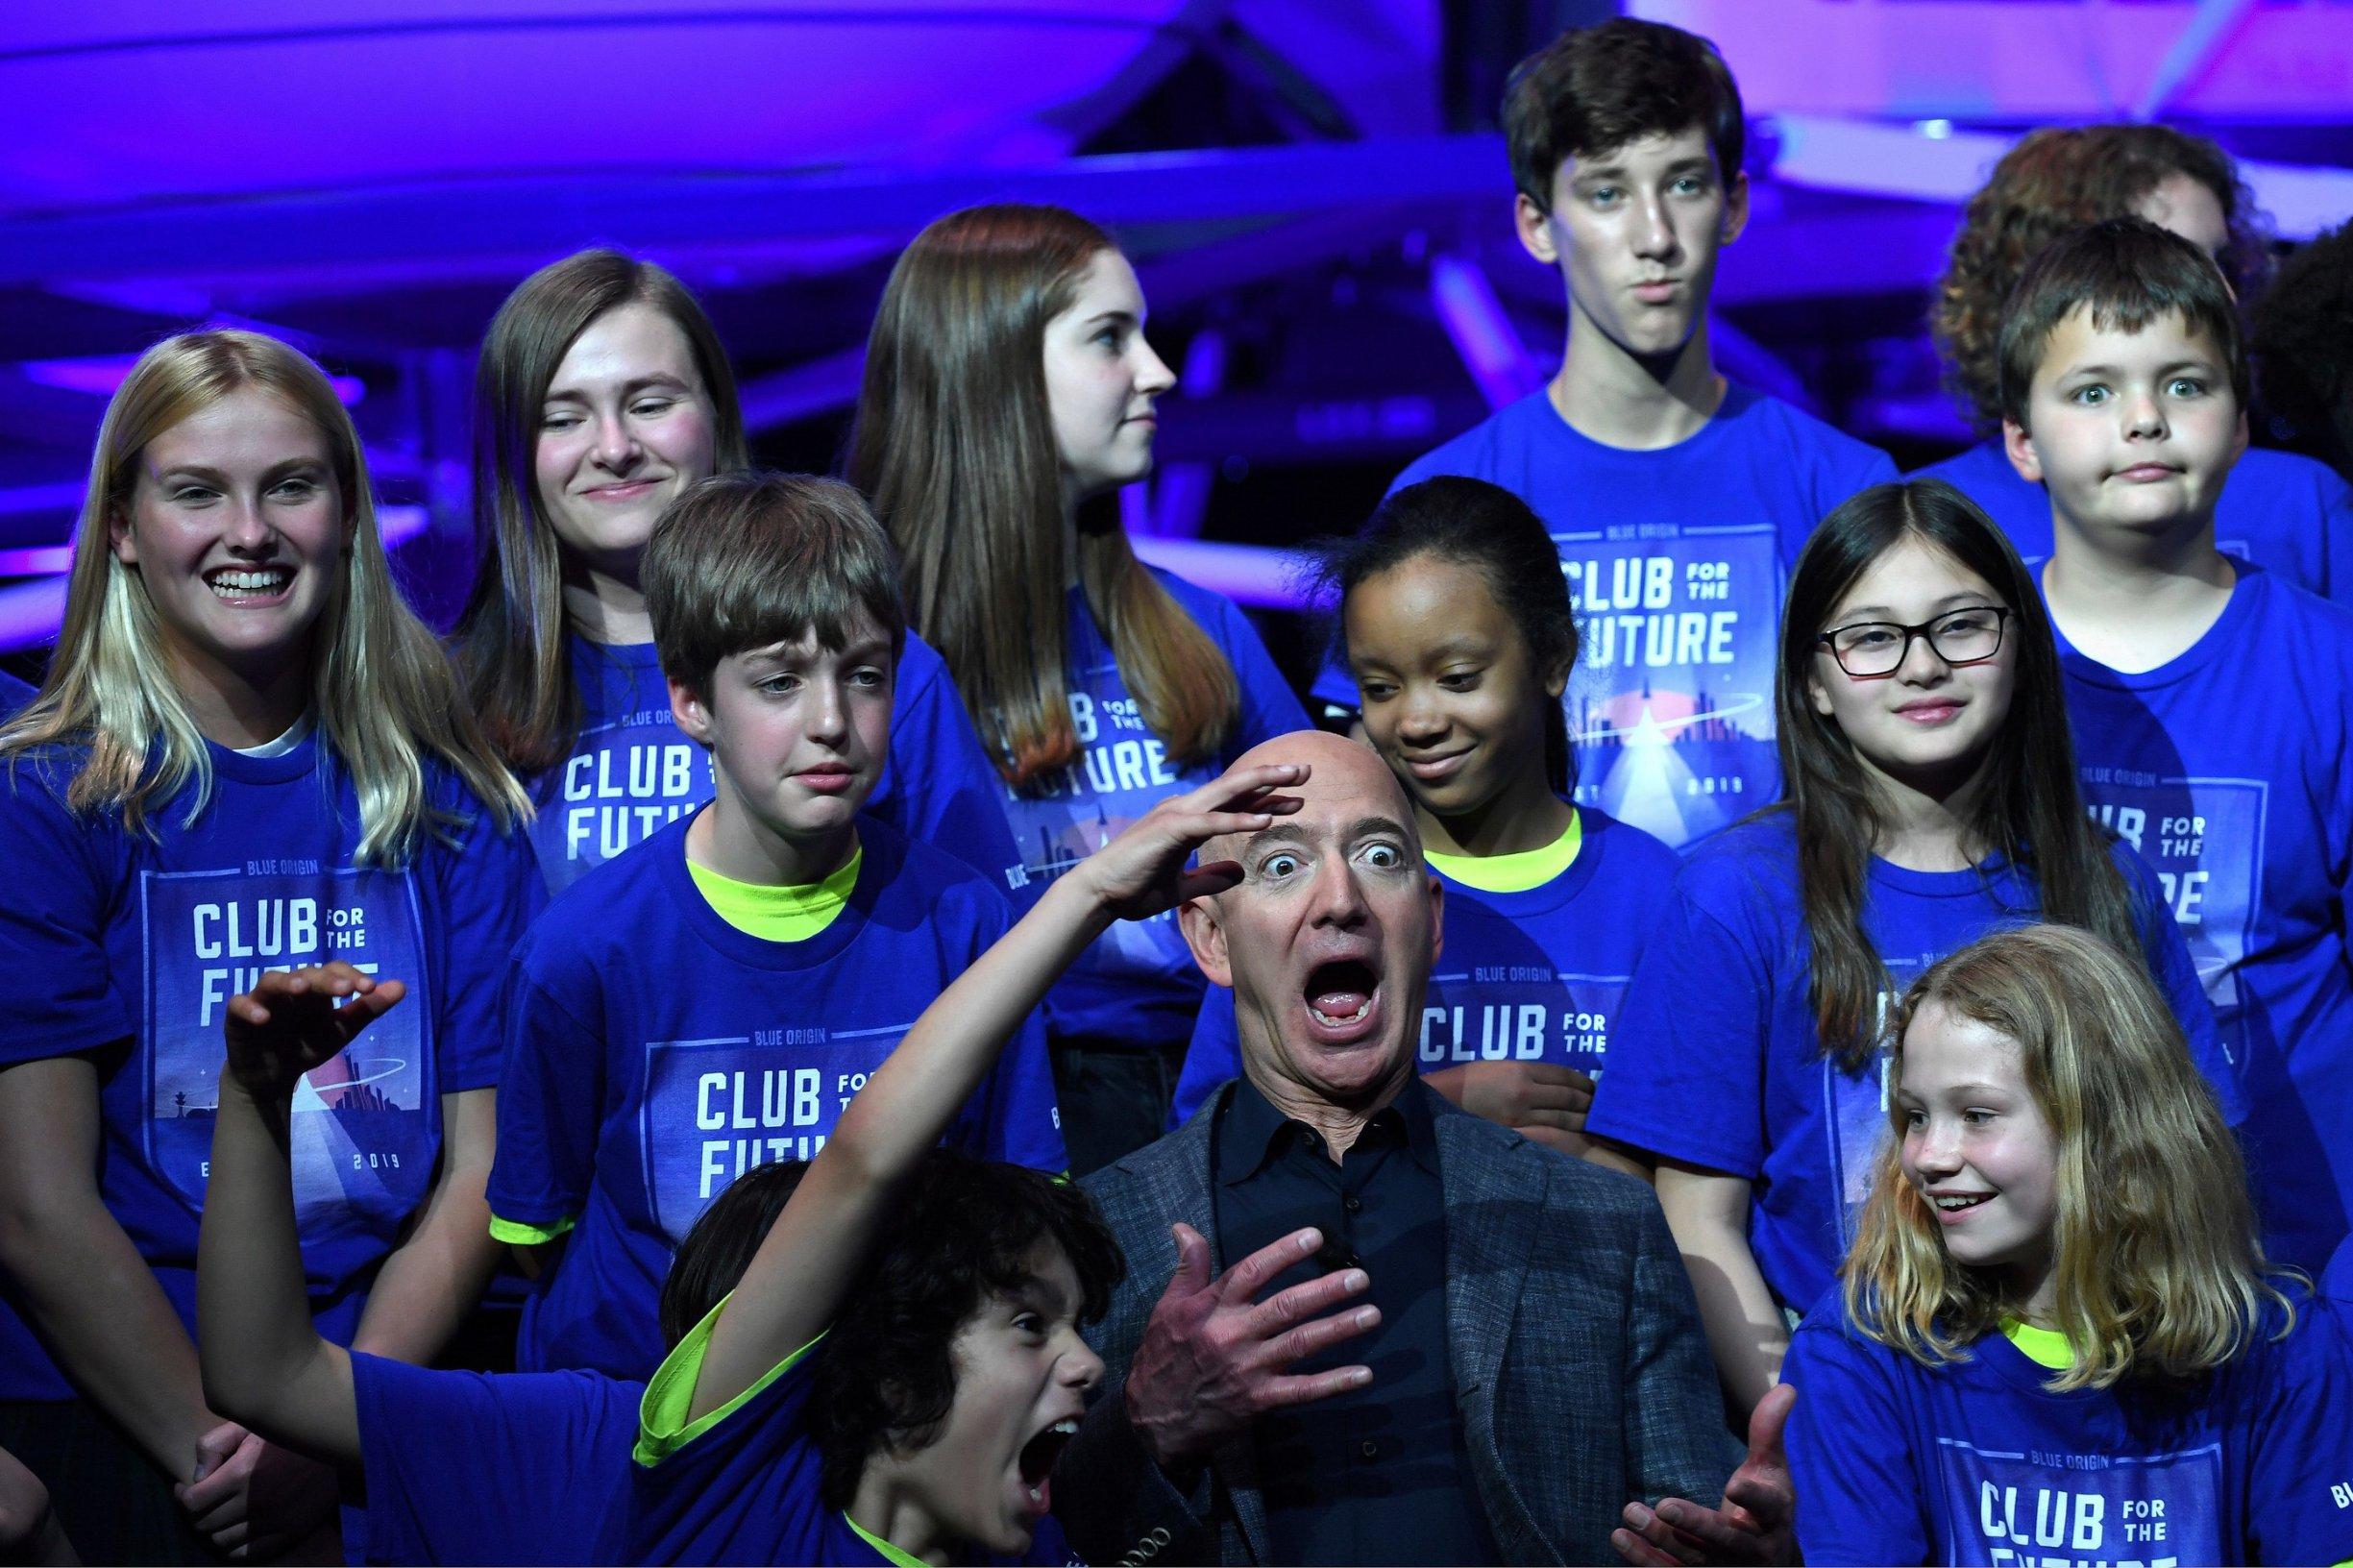 Jeff Bezos predstavio je Blue Moon